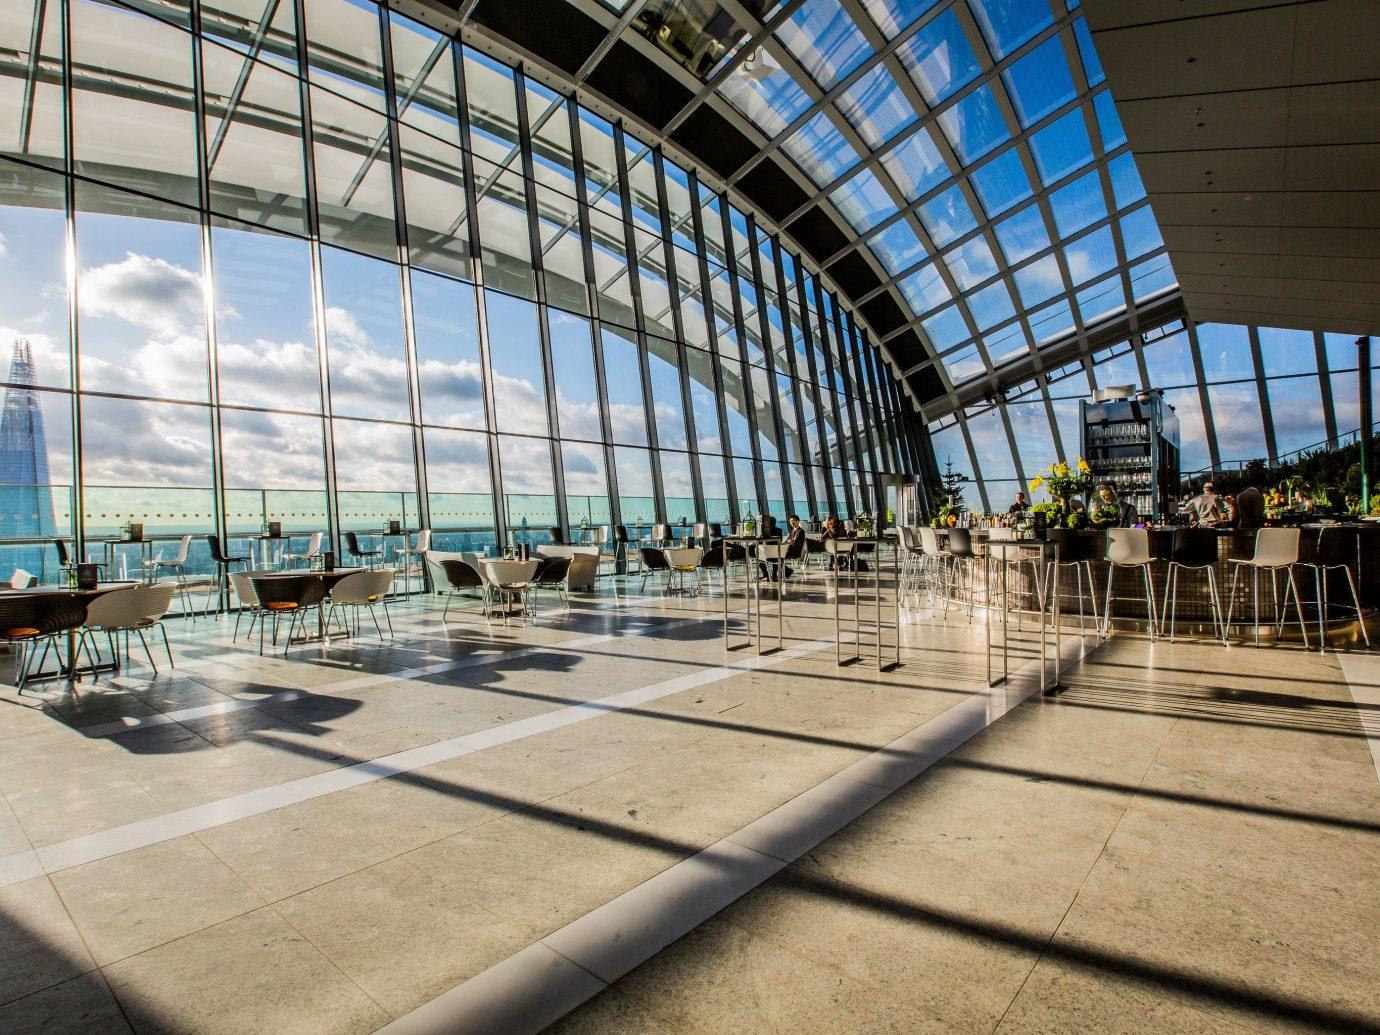 Trip Ideas building outdoor structure Architecture urban area sport venue arena walkway plaza airport stadium headquarters convention center